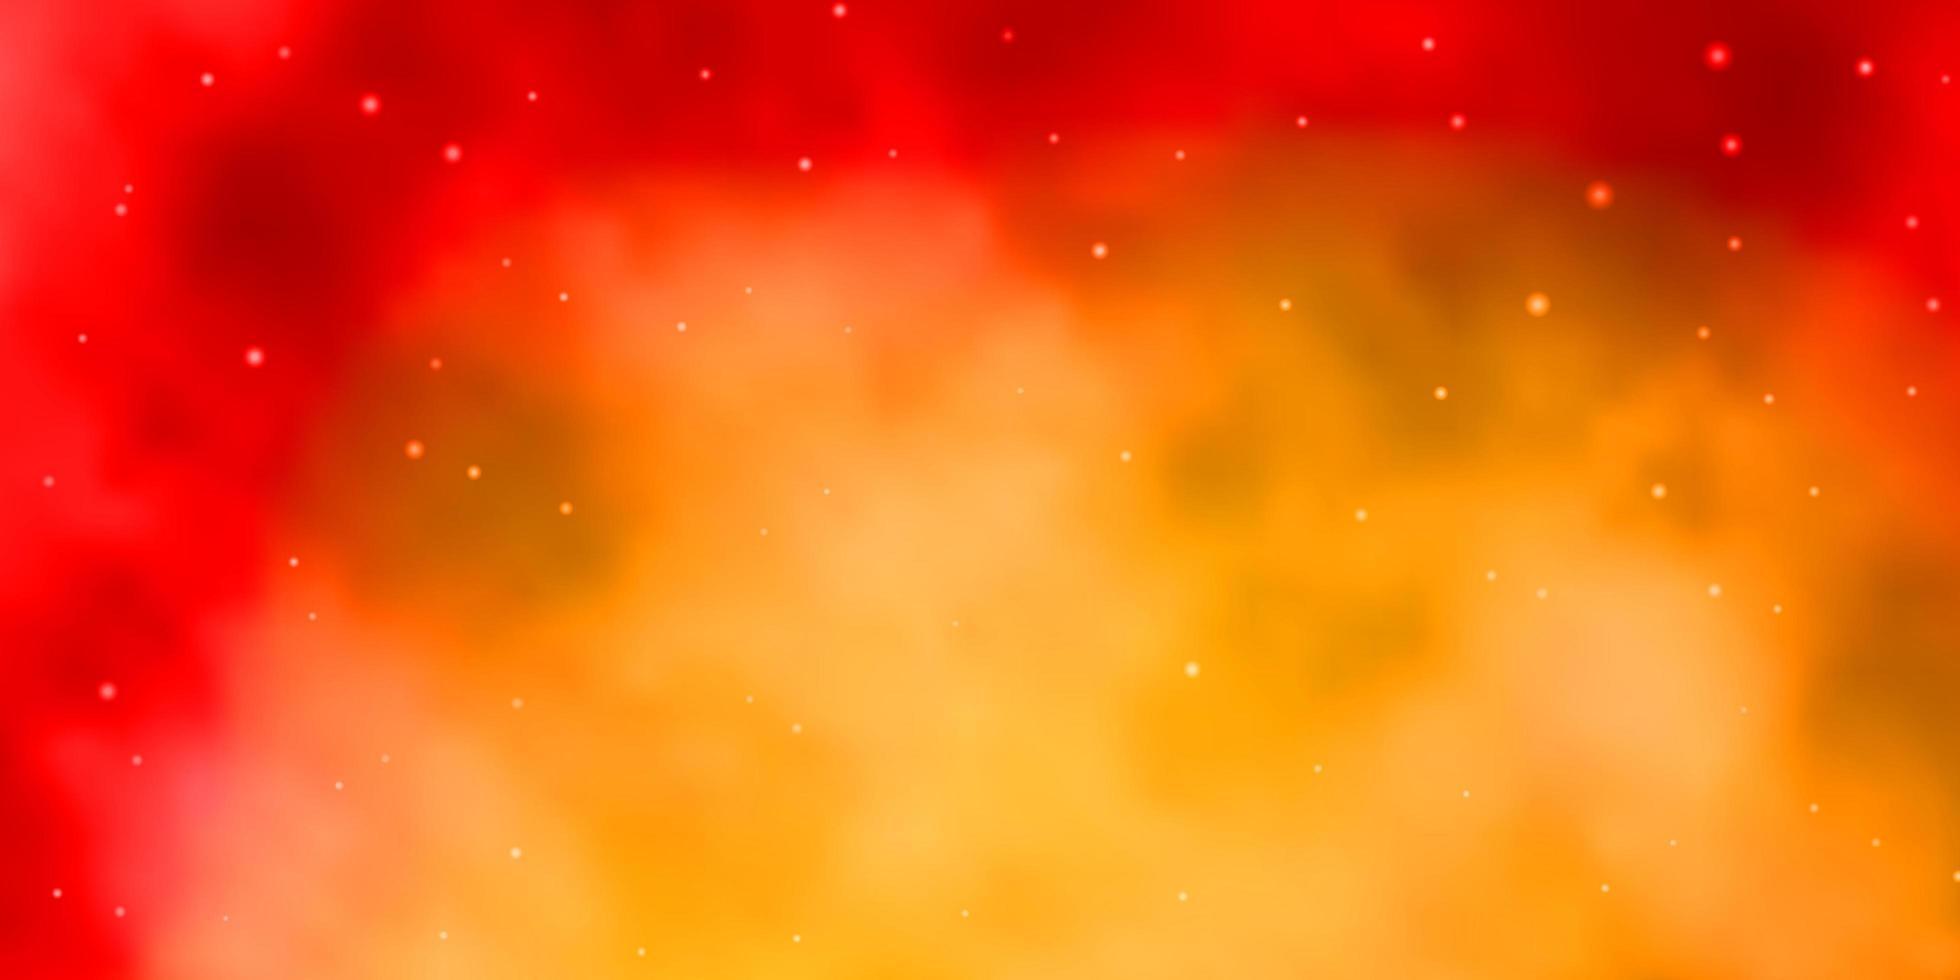 layout de vetor laranja claro com estrelas brilhantes.